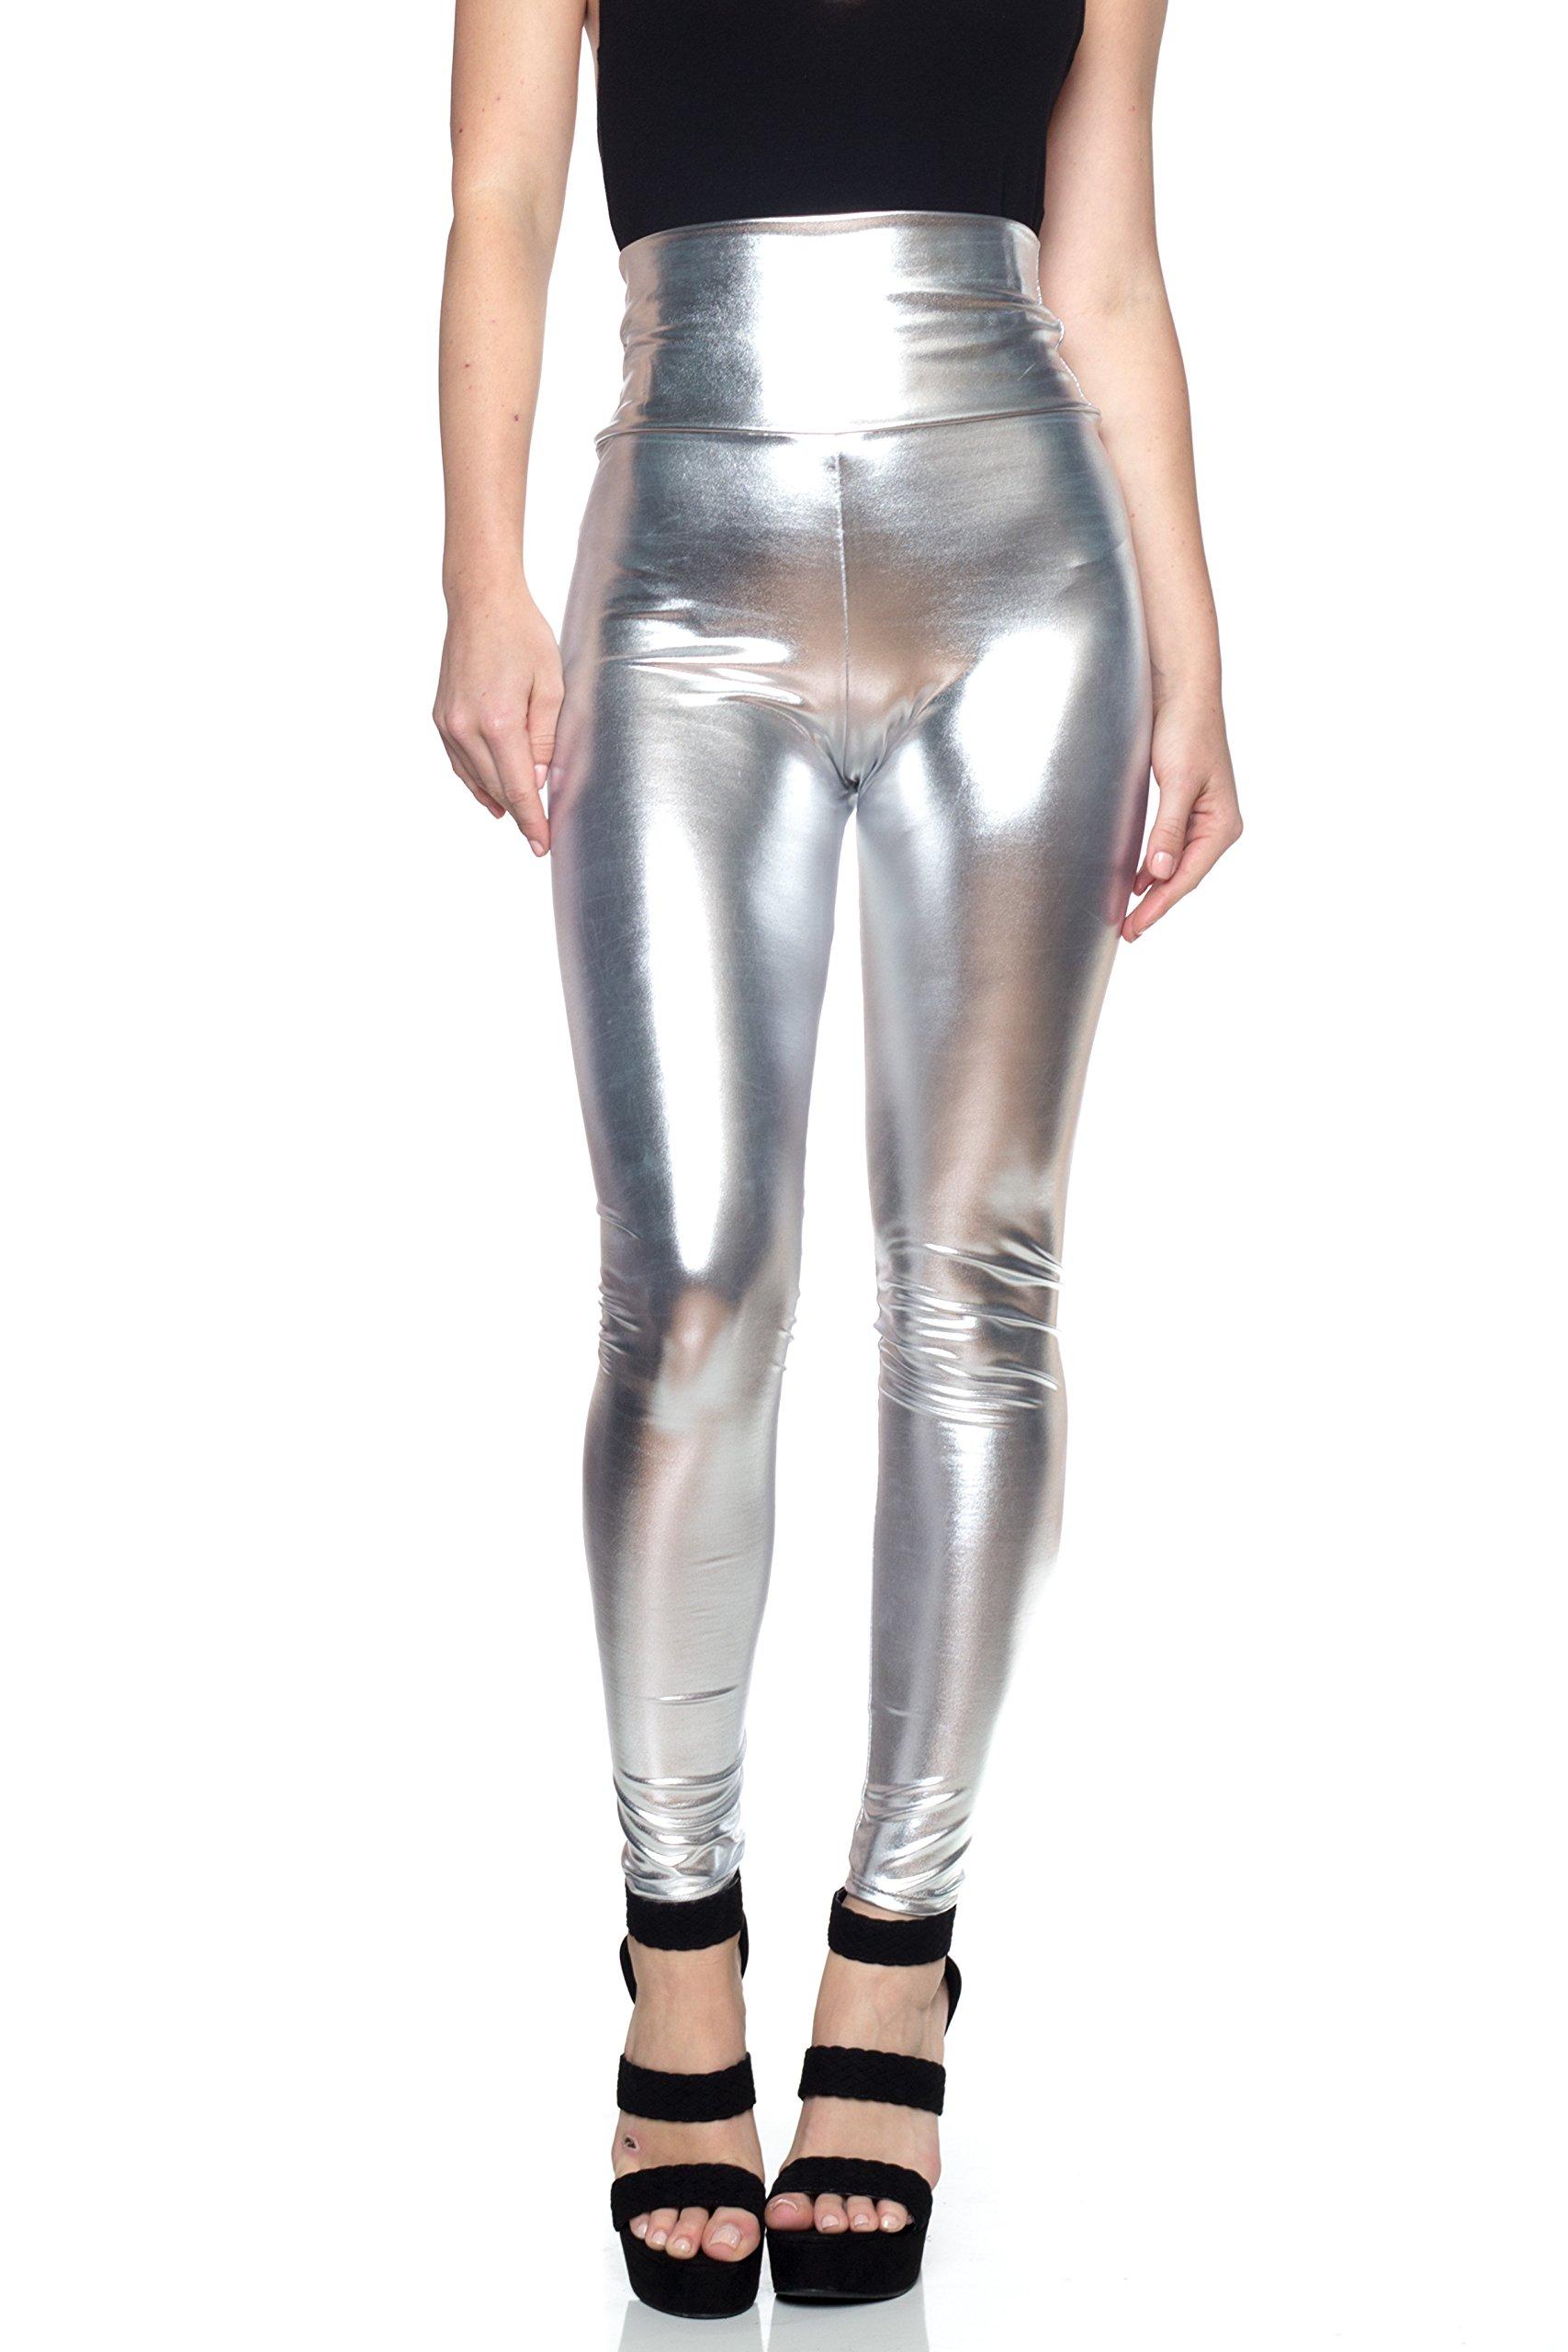 J2 Love Women's Junior Plus Faux Leather High Waist Leggings, 5X, Silver